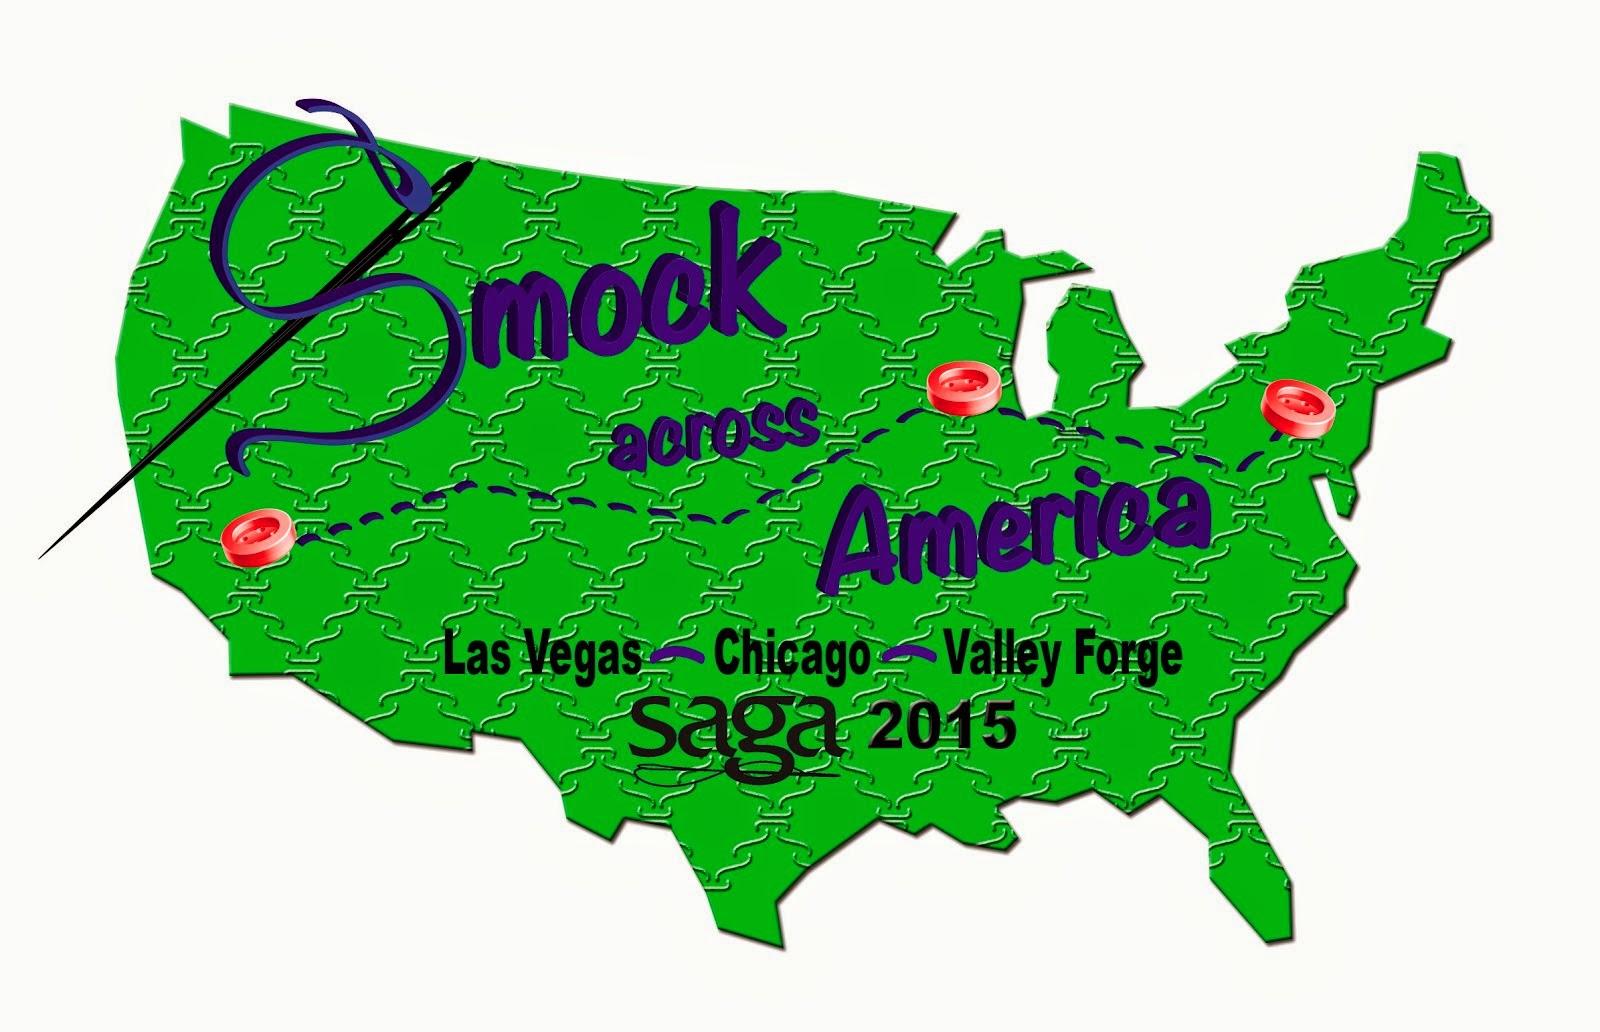 Smock Across America!